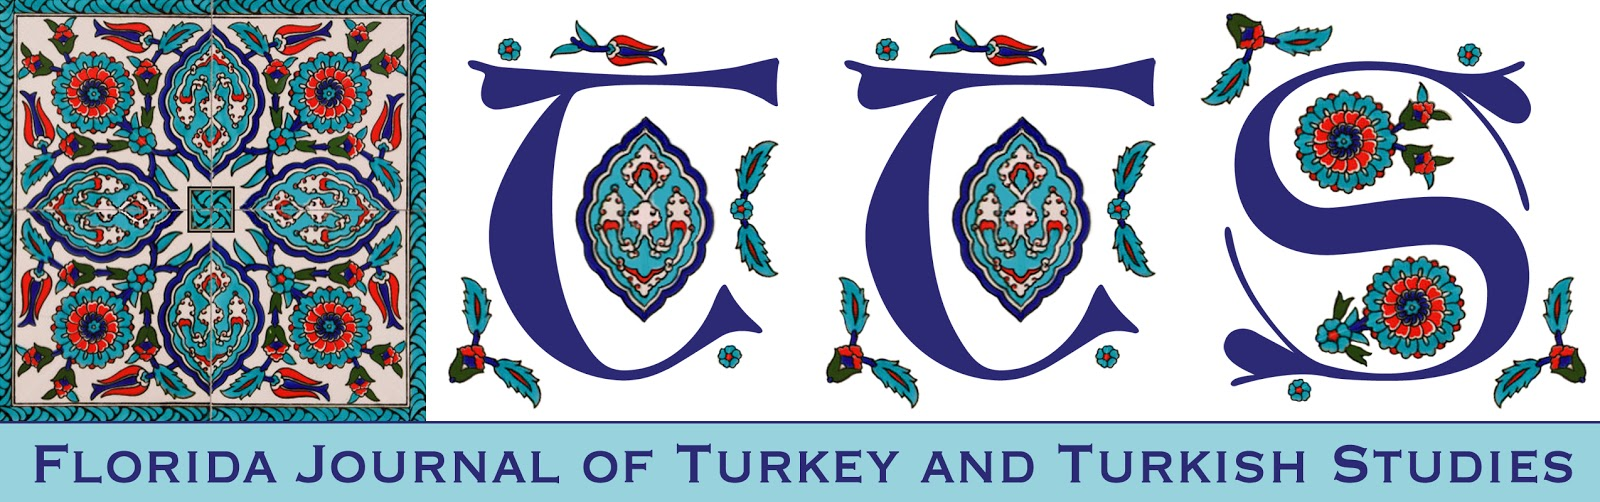 http://2.bp.blogspot.com/-1f9qv2JcRjM/UjCsb2BRE8I/AAAAAAAAAG4/x3rxNWJYgXQ/s1600/Florida+Journal+of+Turkish+Studies.jpg